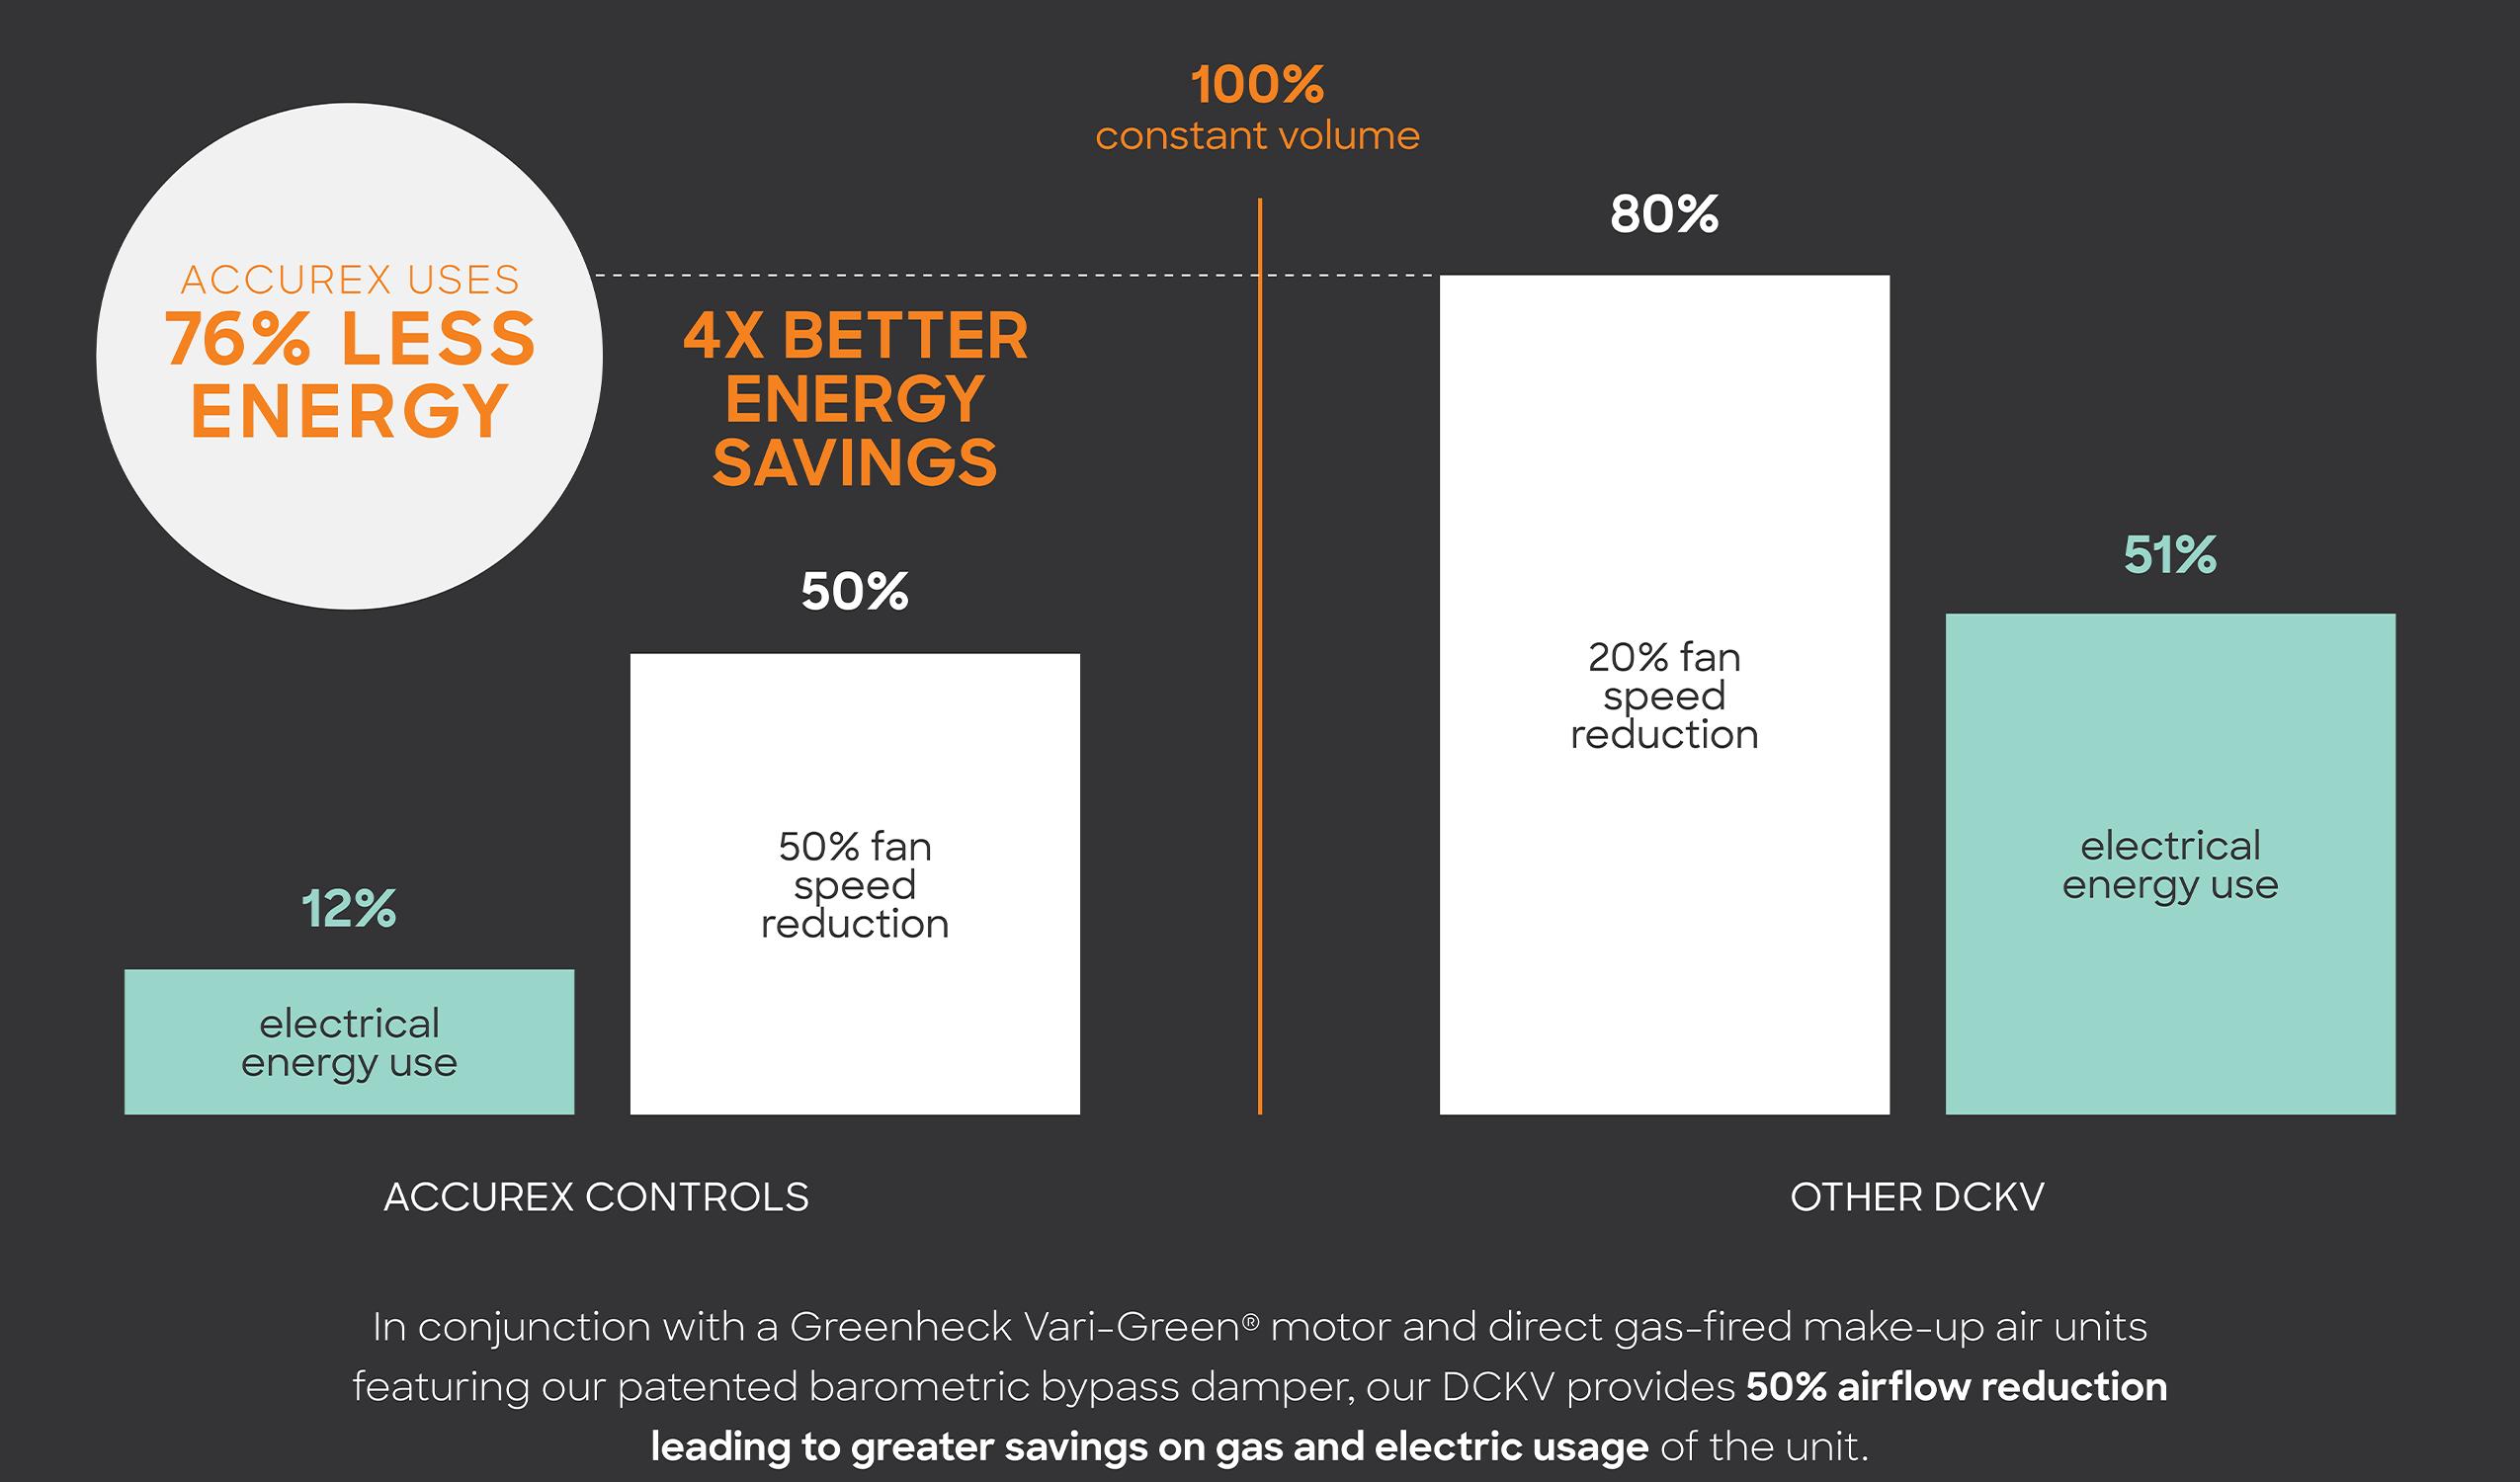 DCKV Savings